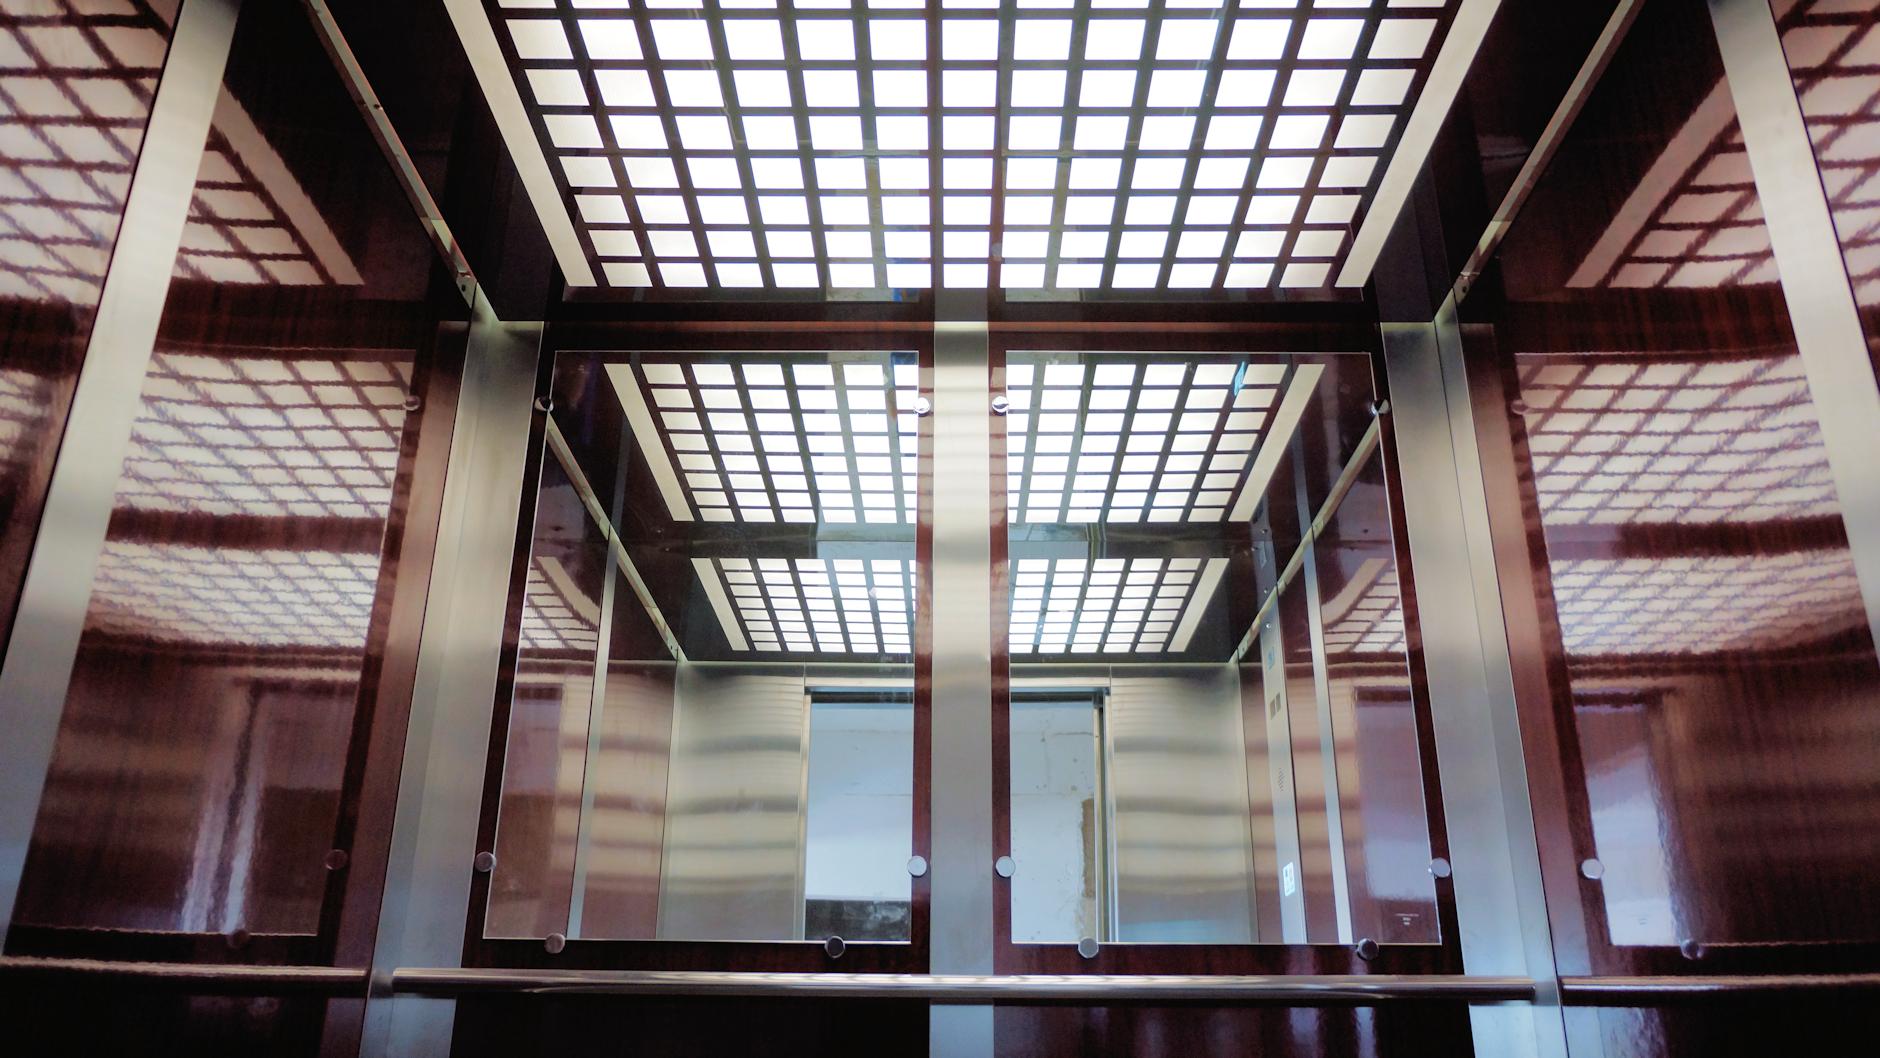 NEXTLEVEL ανελκυστήρες - ασανσερ kleemann μελετη - εγκατασταση - συντηρηση (19)